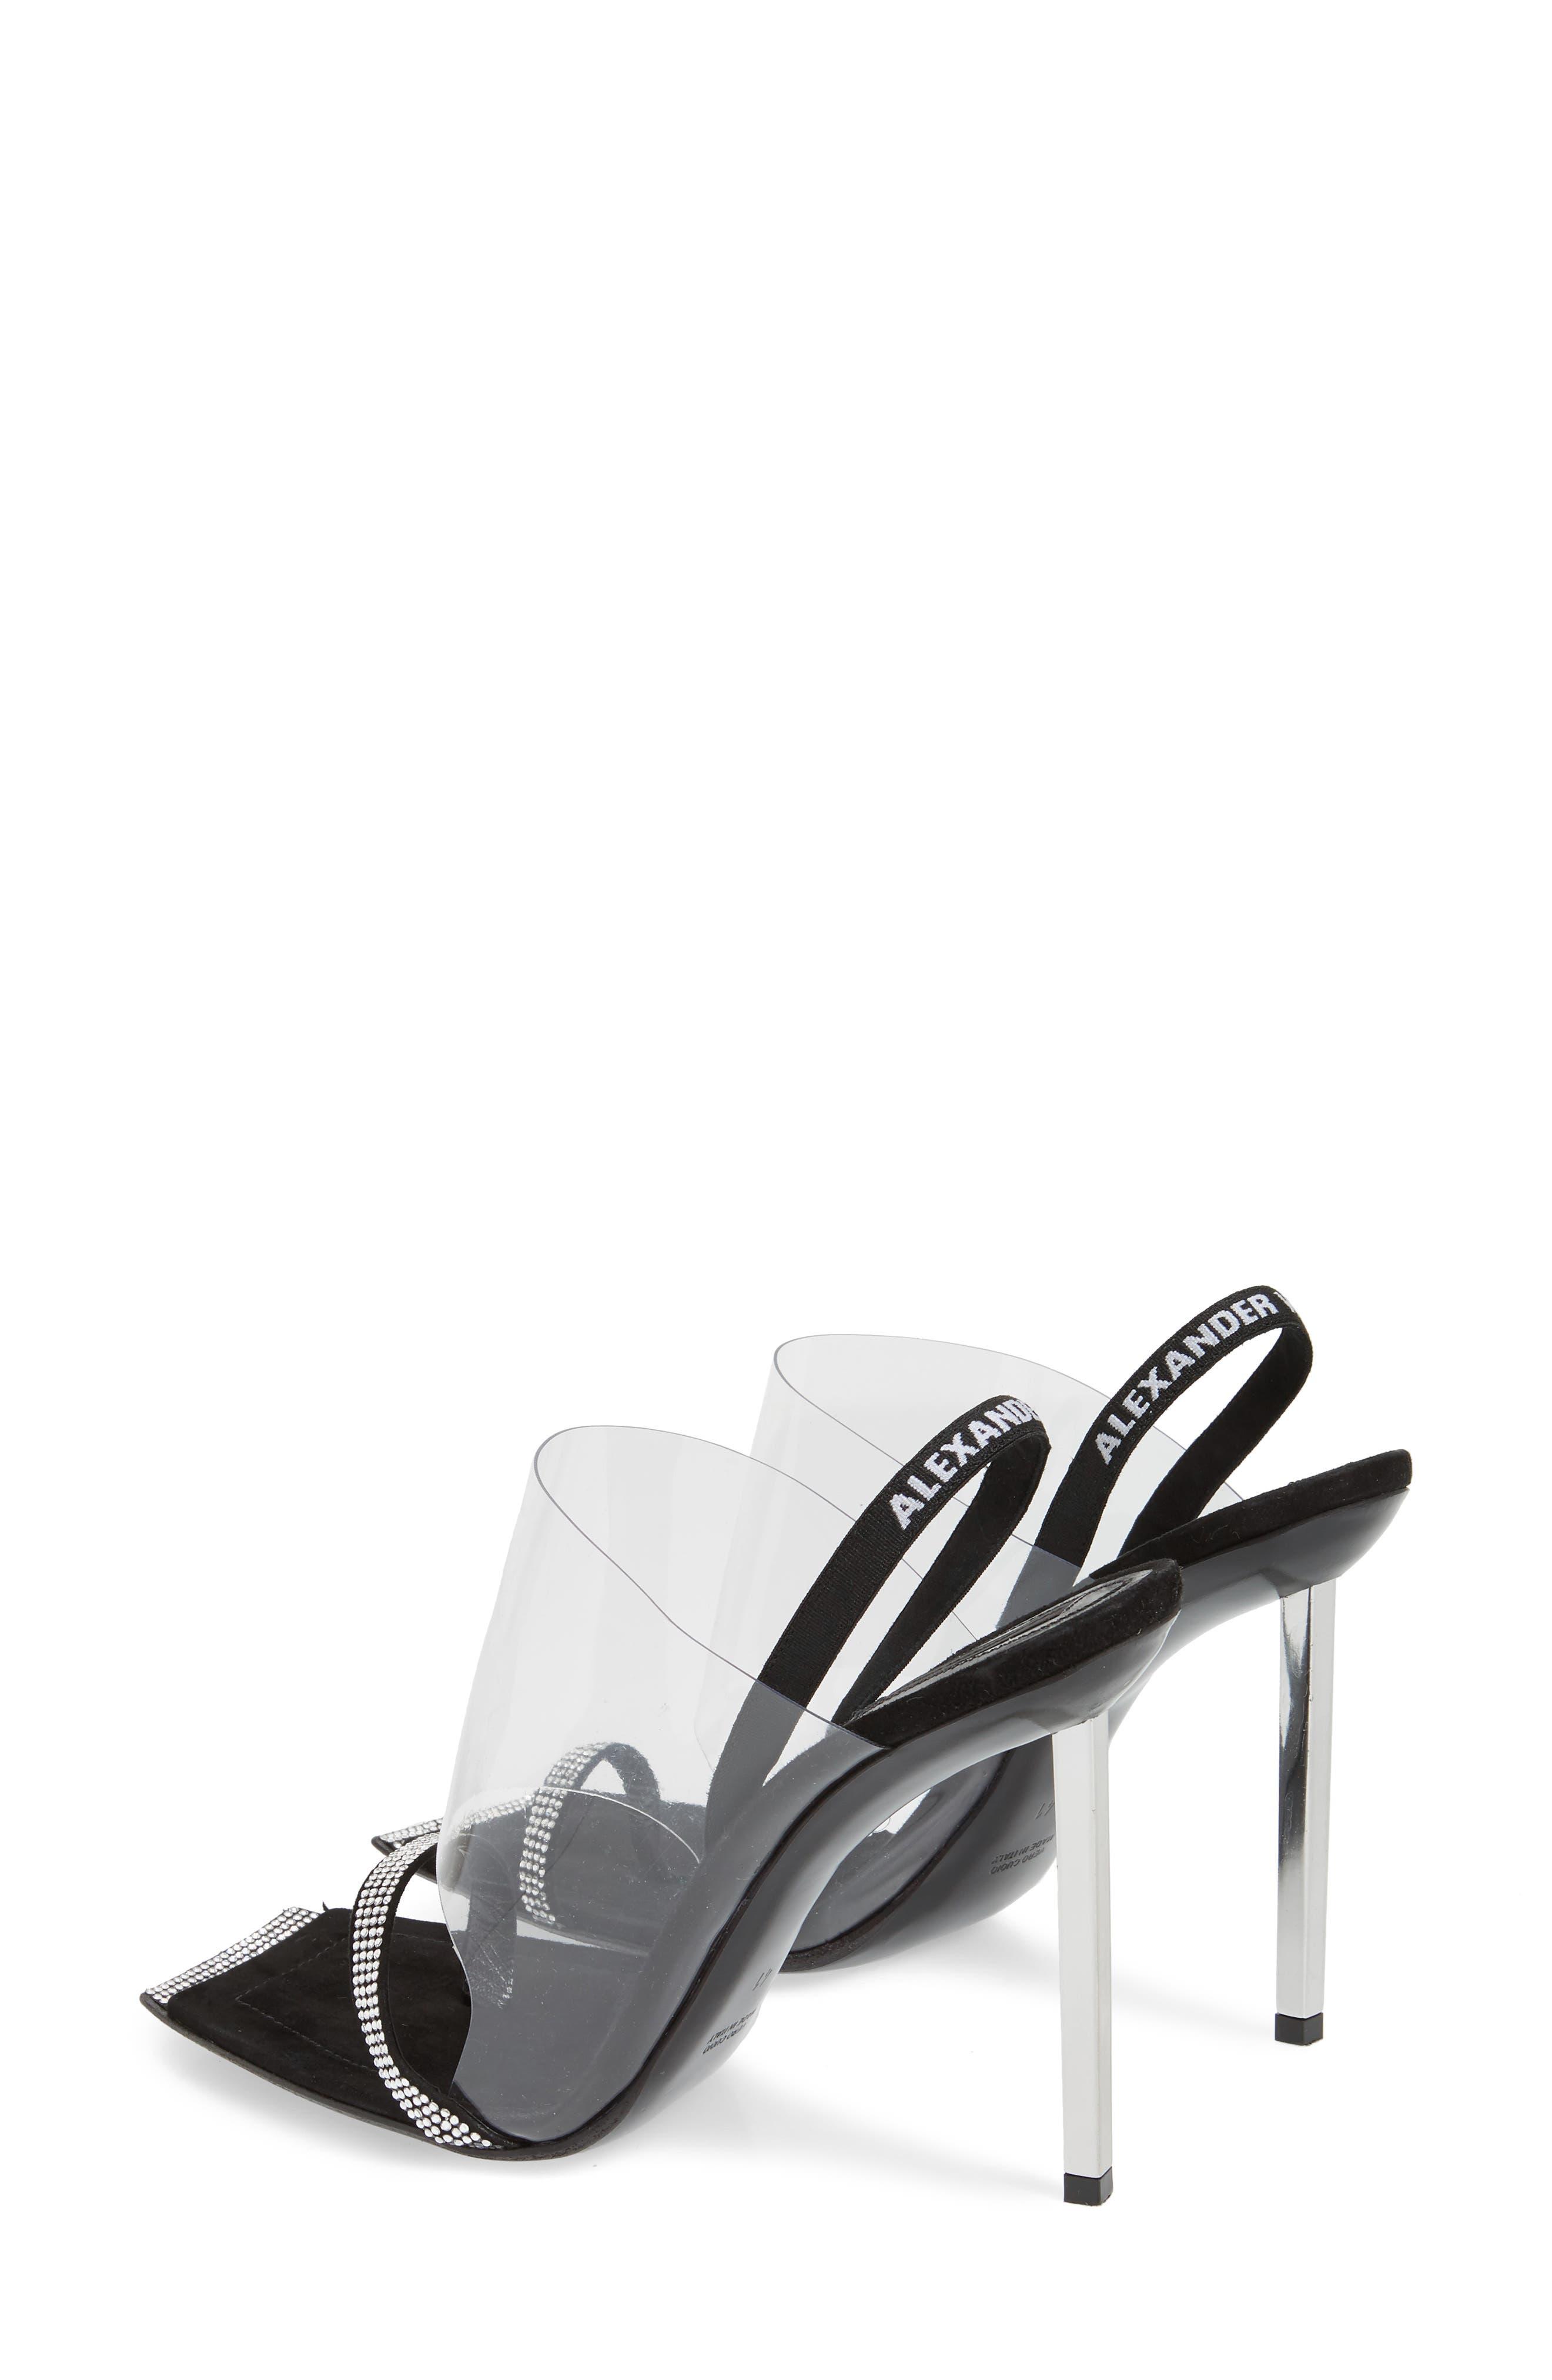 ALEXANDER WANG, Clear Shield Sandal, Alternate thumbnail 3, color, BLACK